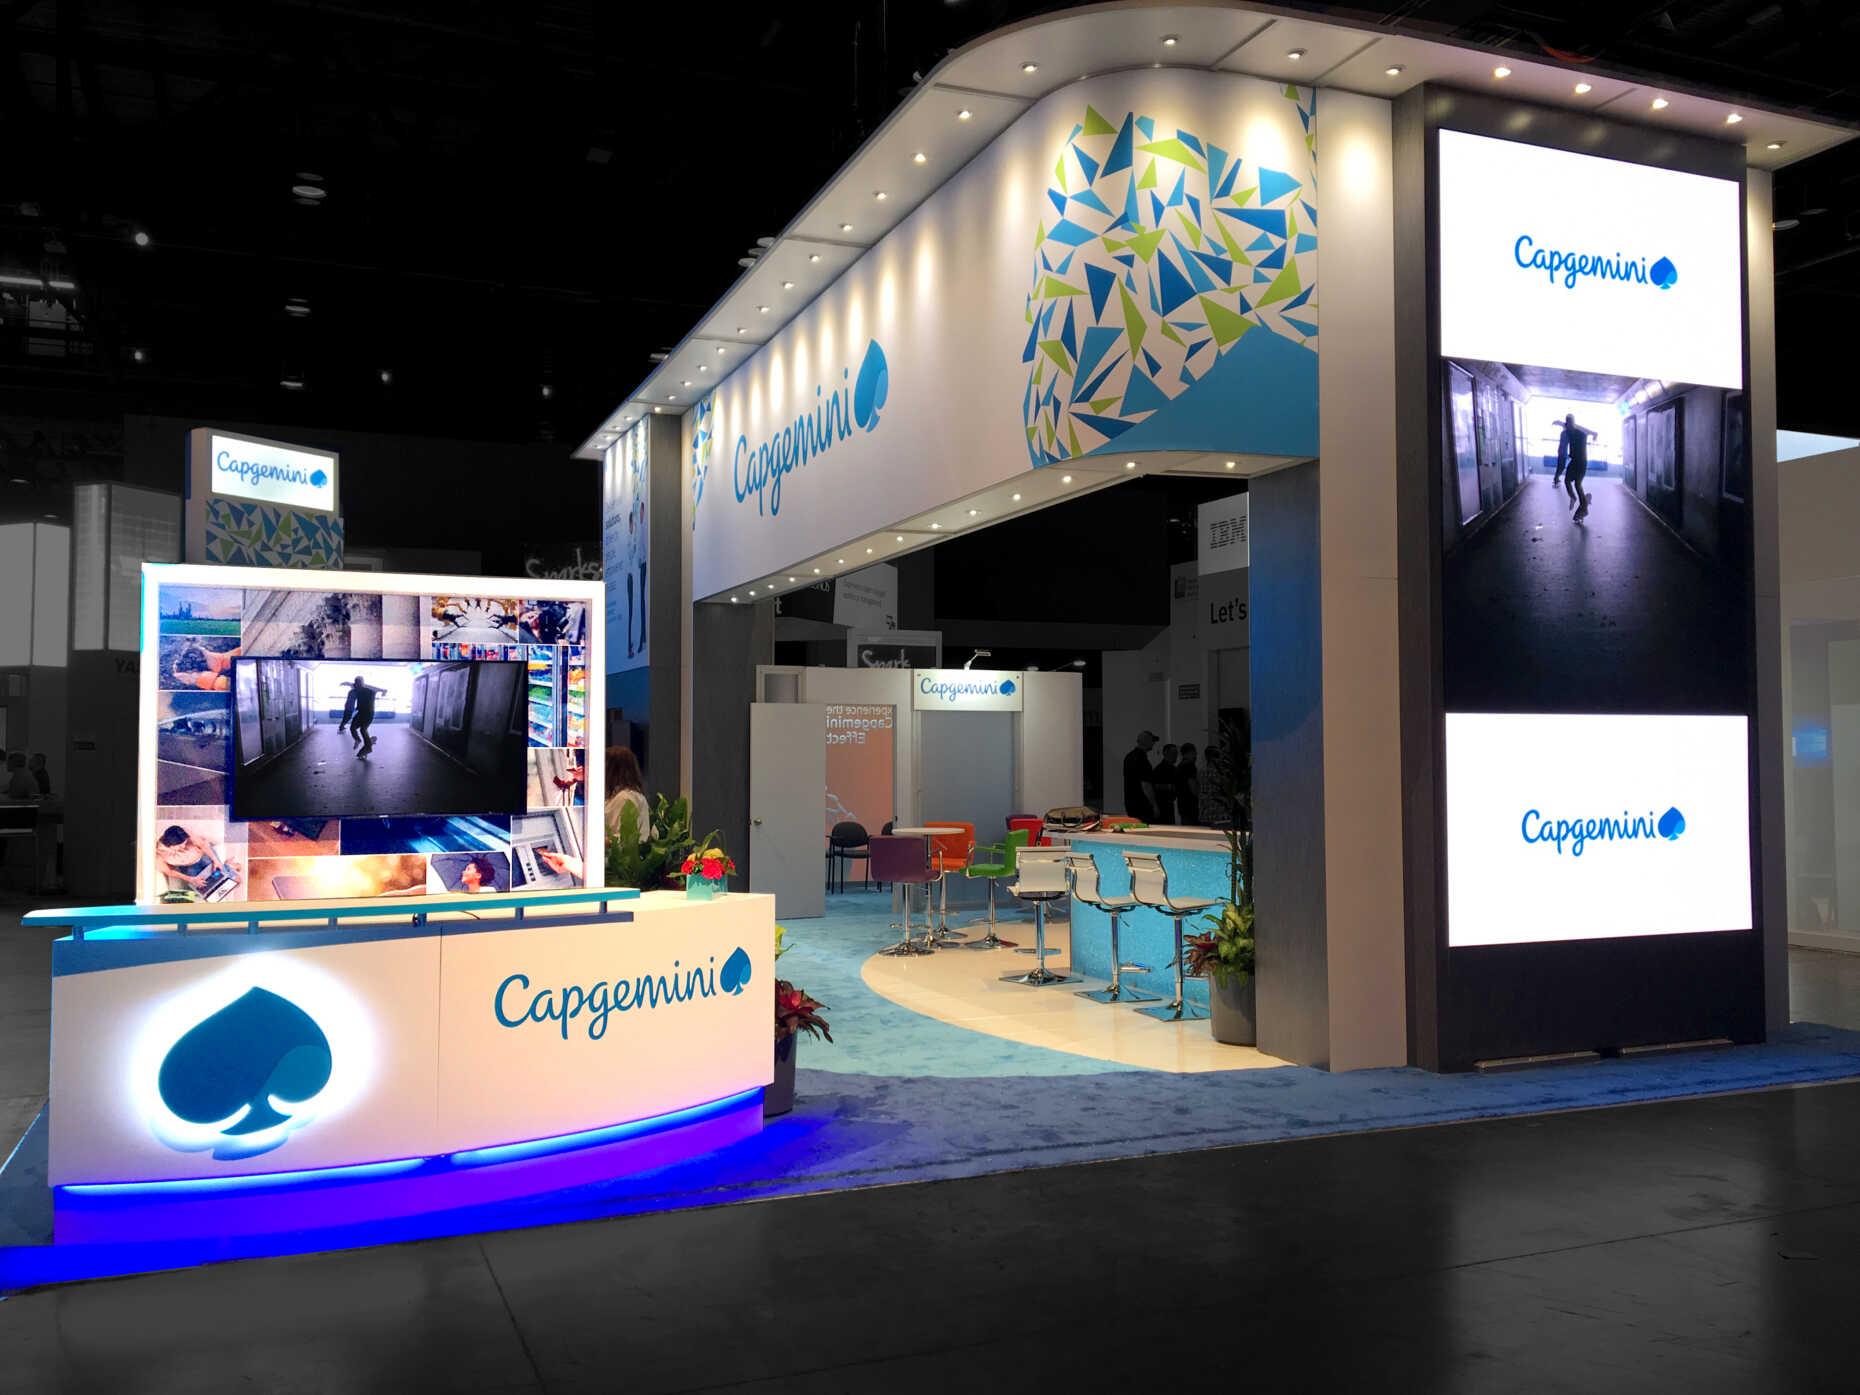 Capgemini 30x40 booth at SAPPHIRE NOW